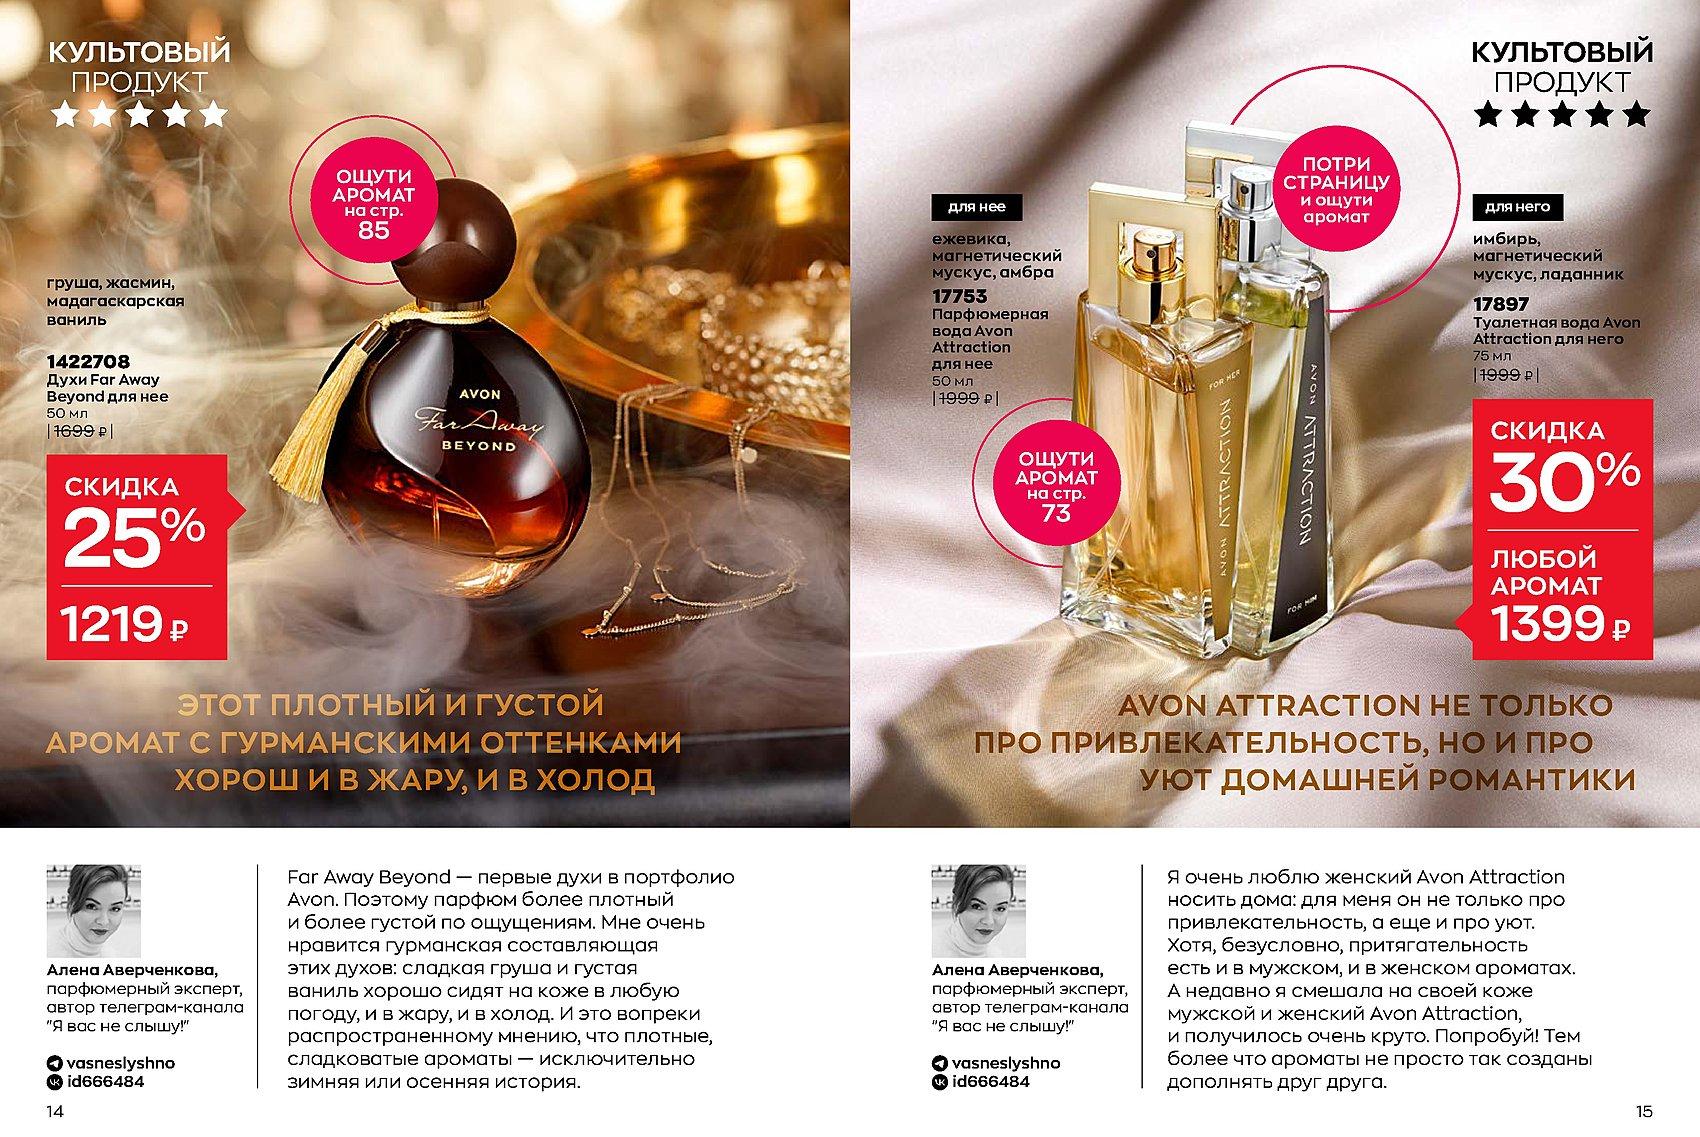 Страницы 14 - 15 каталог